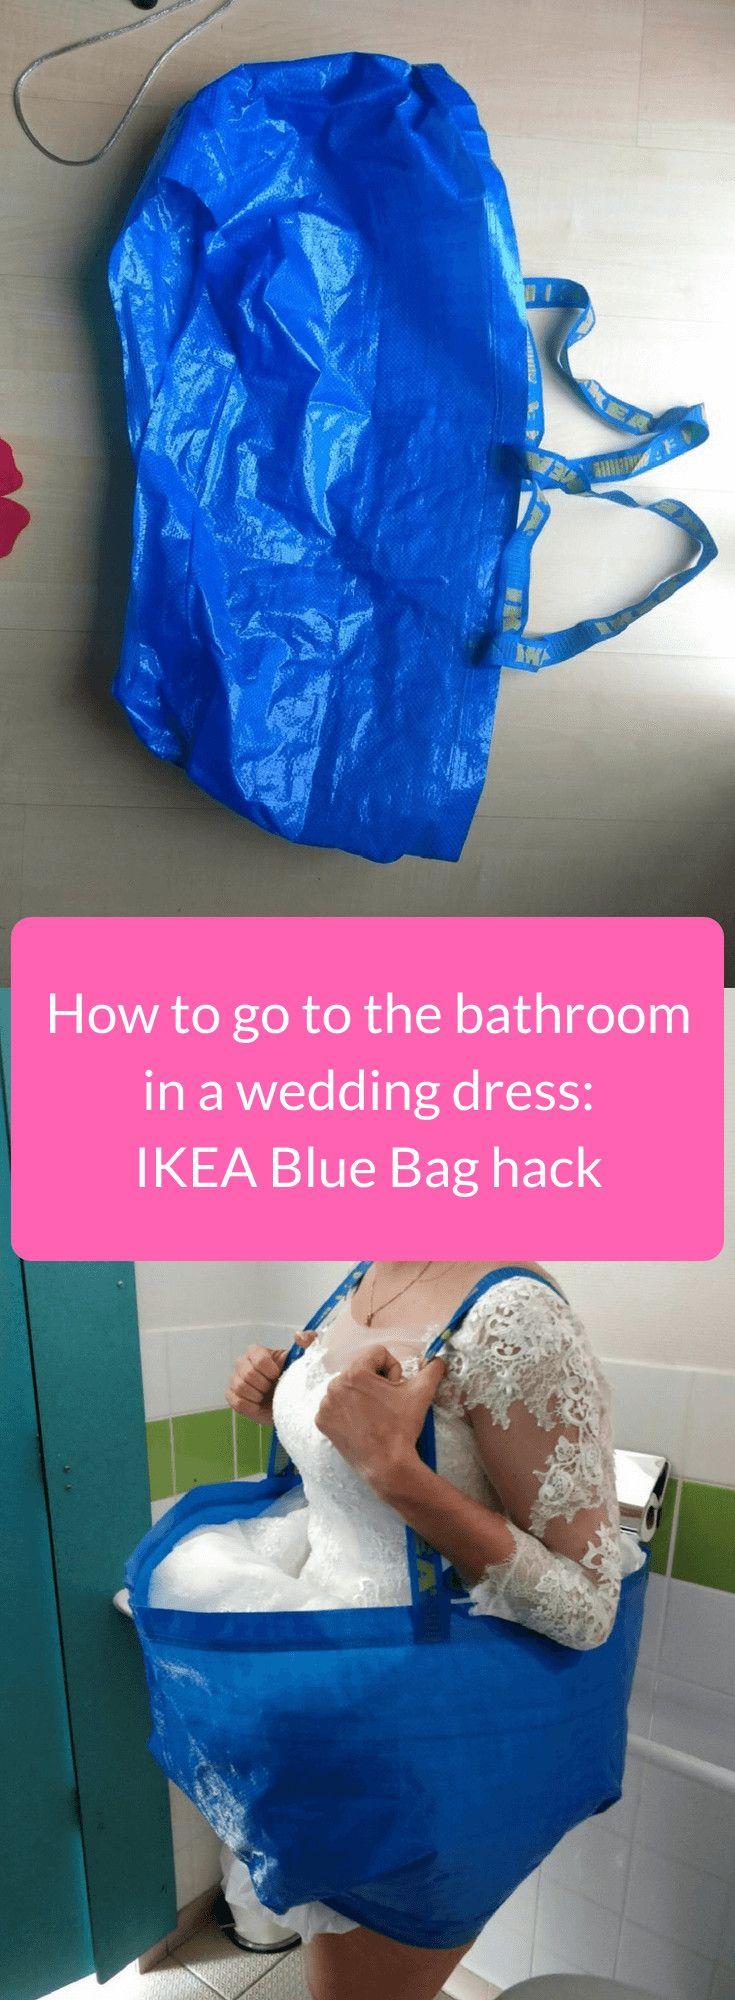 How To Go The Bathroom In A Wedding Dress An Ikea Blue Bag Hack